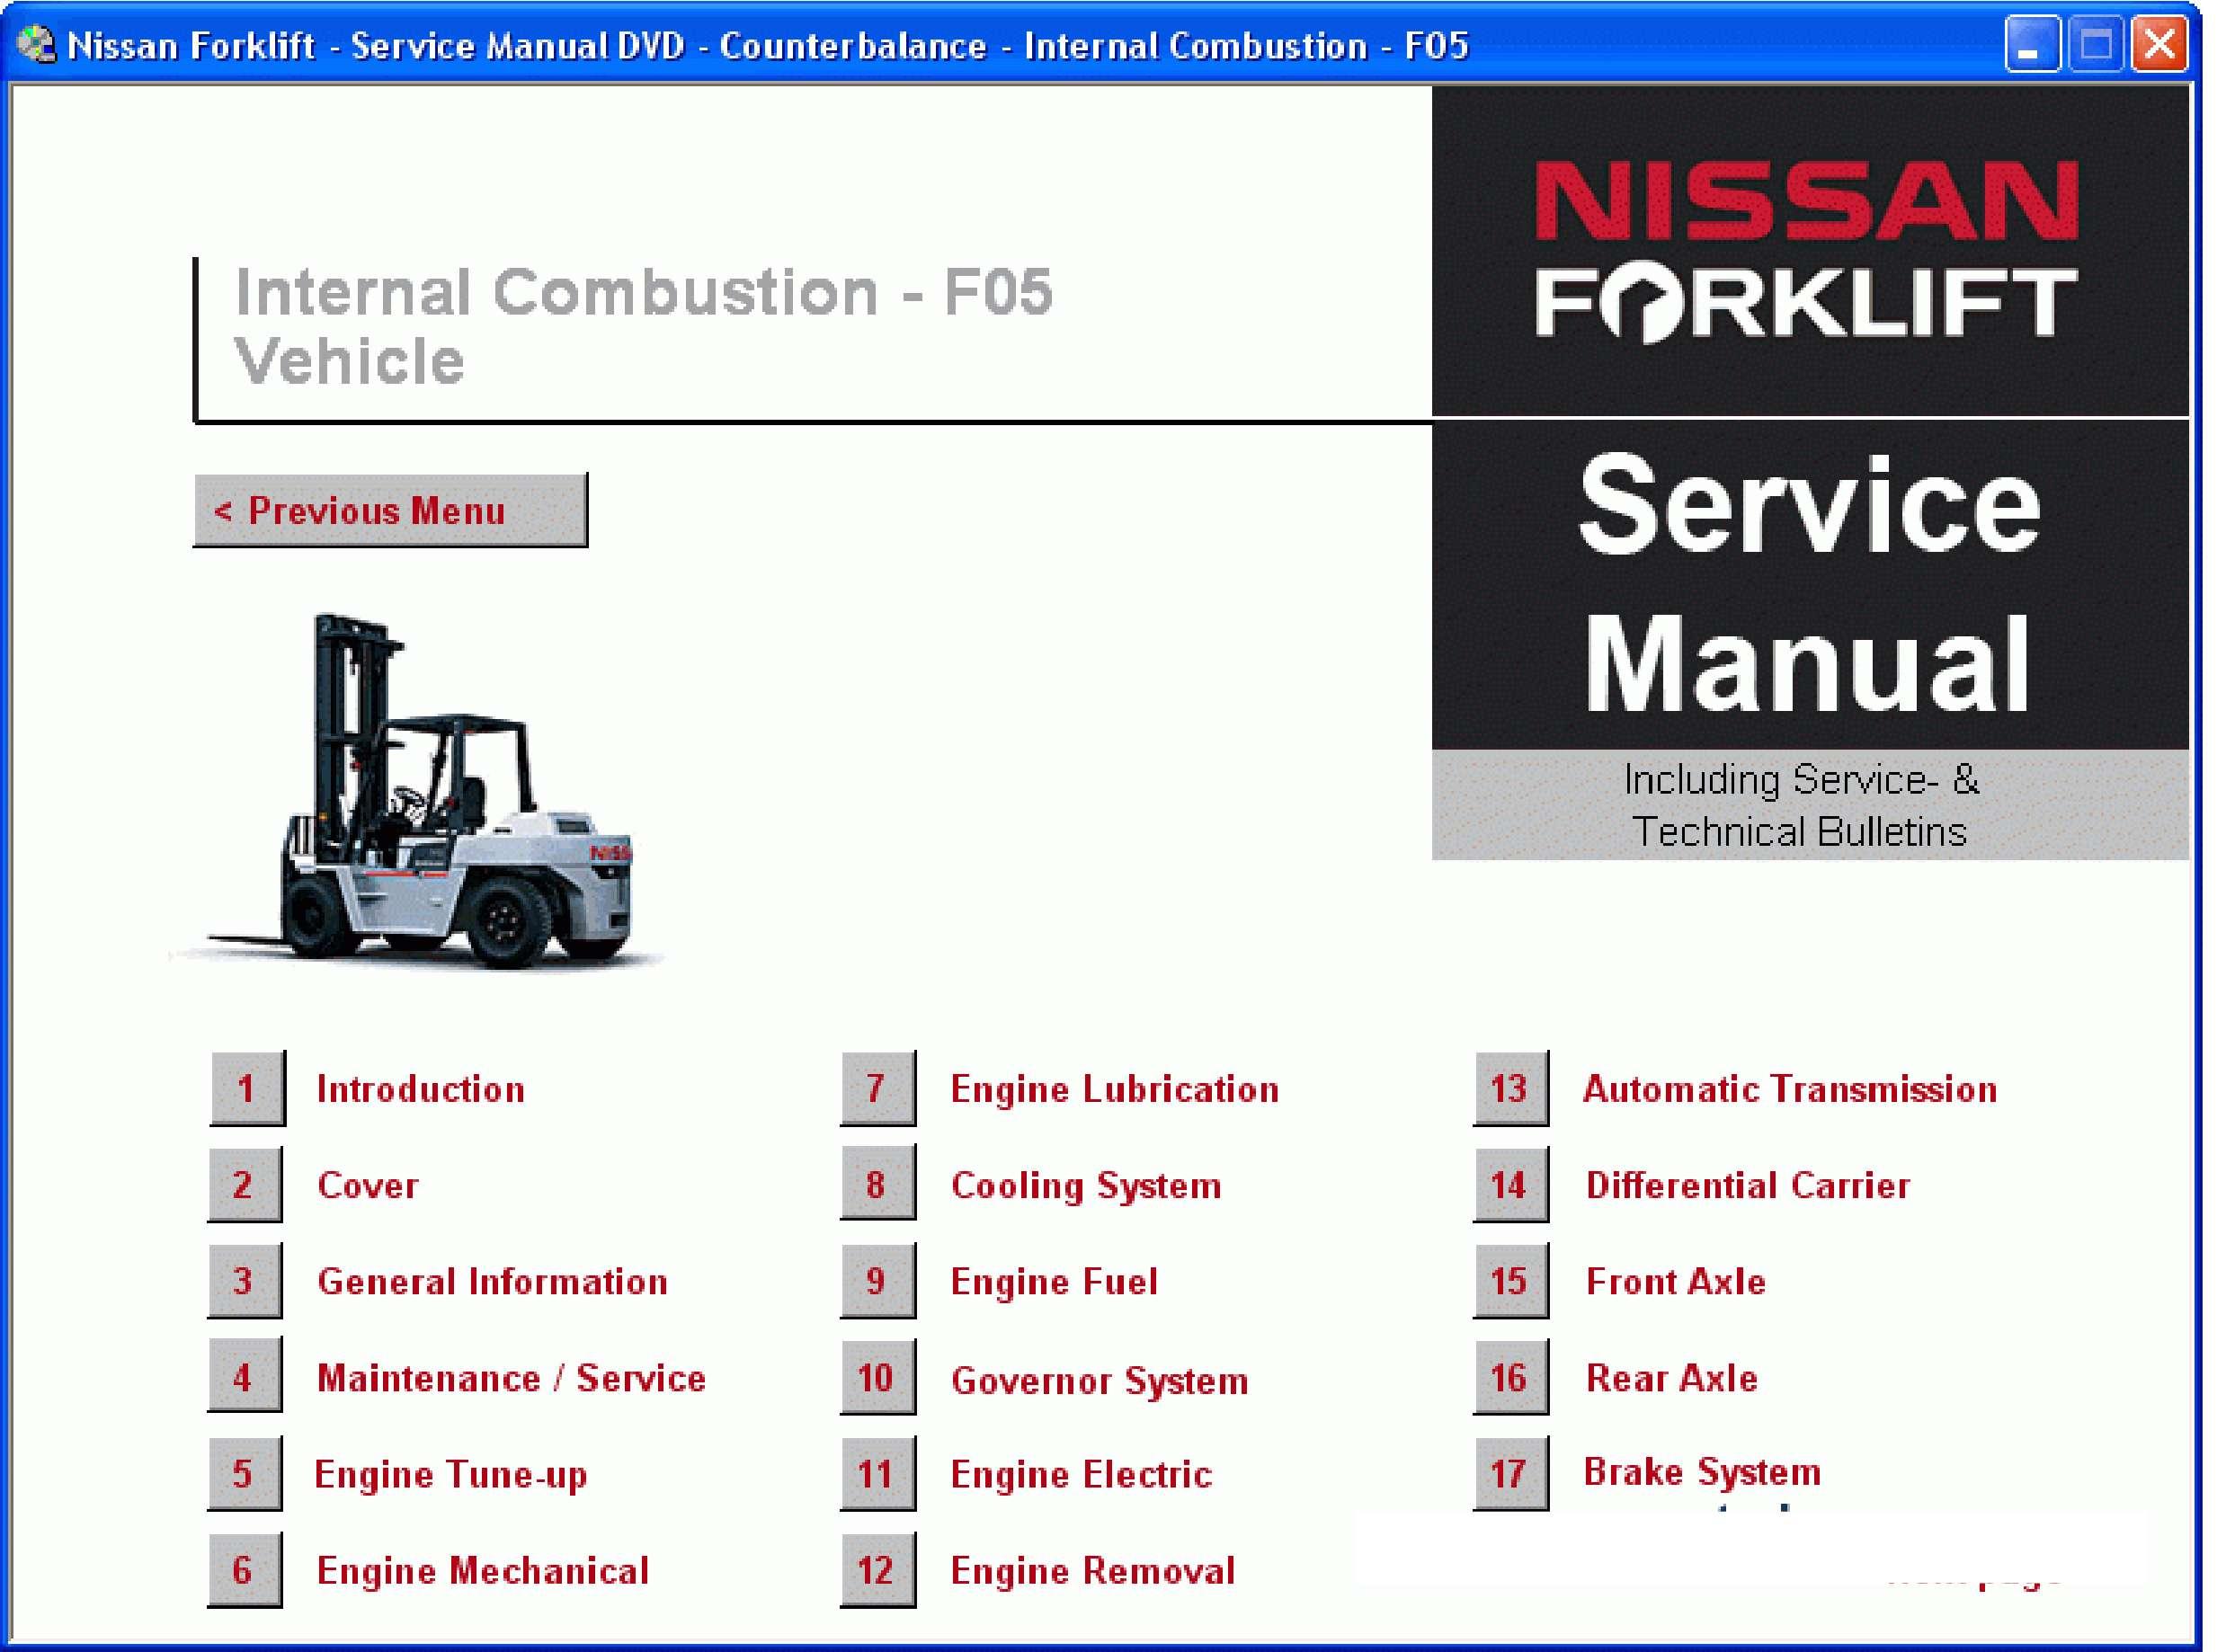 Nissan Forklift Service Manual SS-01